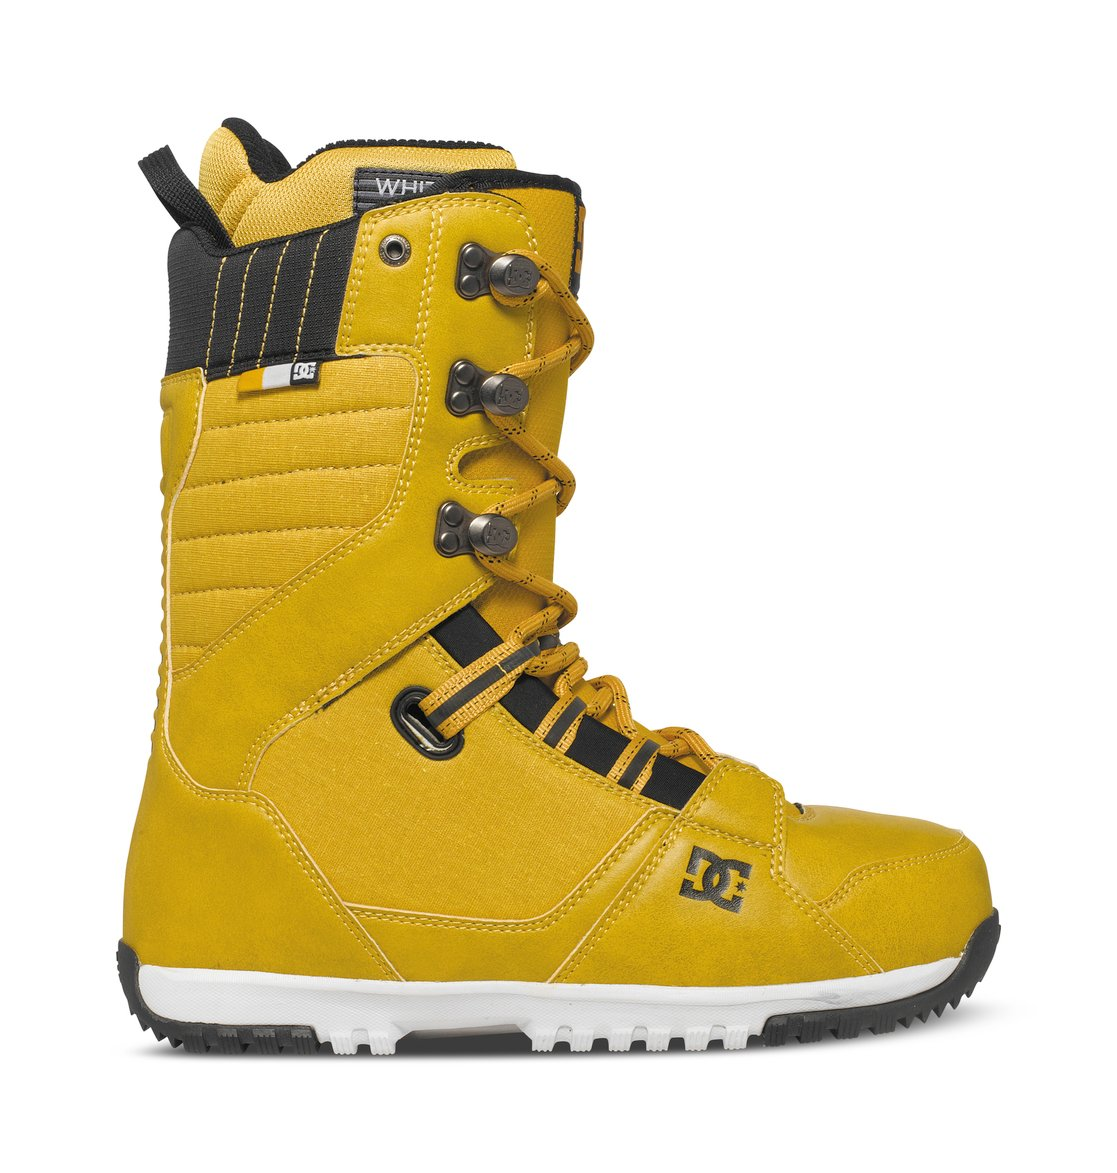 Mens Mutiny Snowboard Boots Adyo200020 Dc Shoes